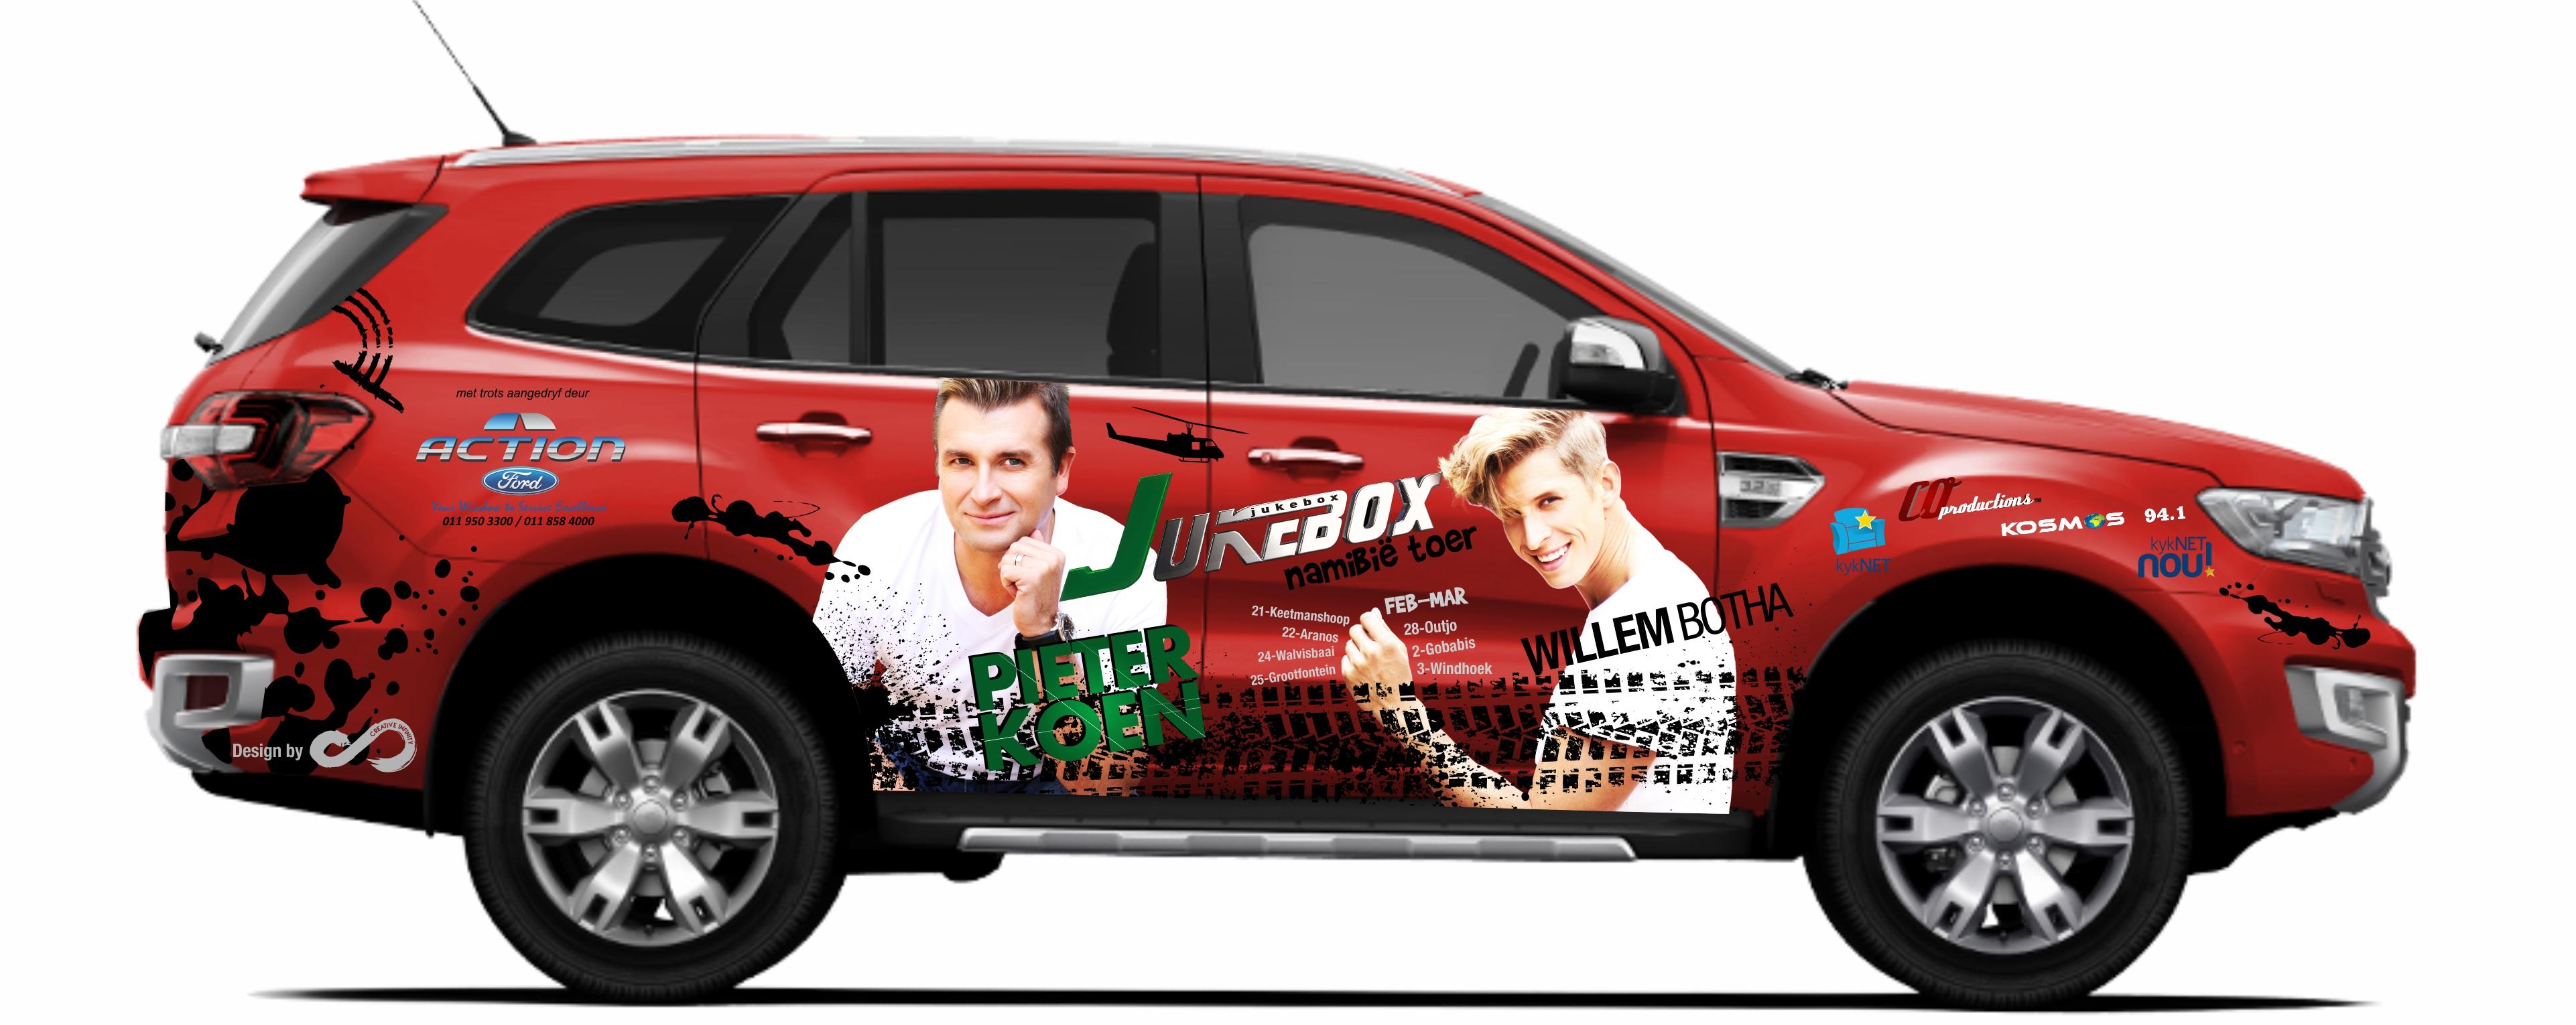 Willem Botha - Vehicle Branding